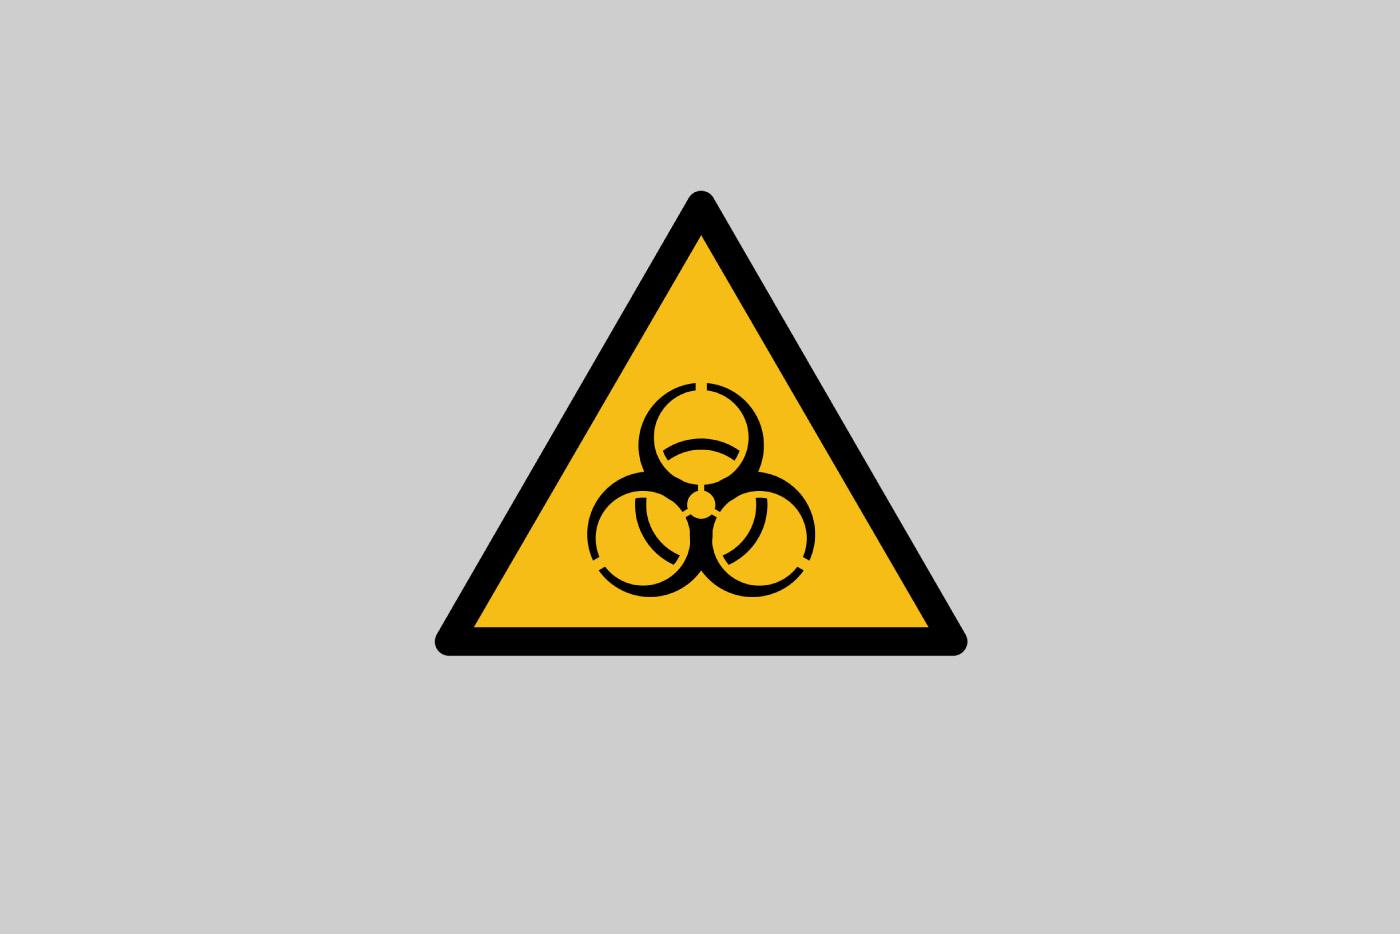 Hygienemaßnahmen neuartiges Coronavirus